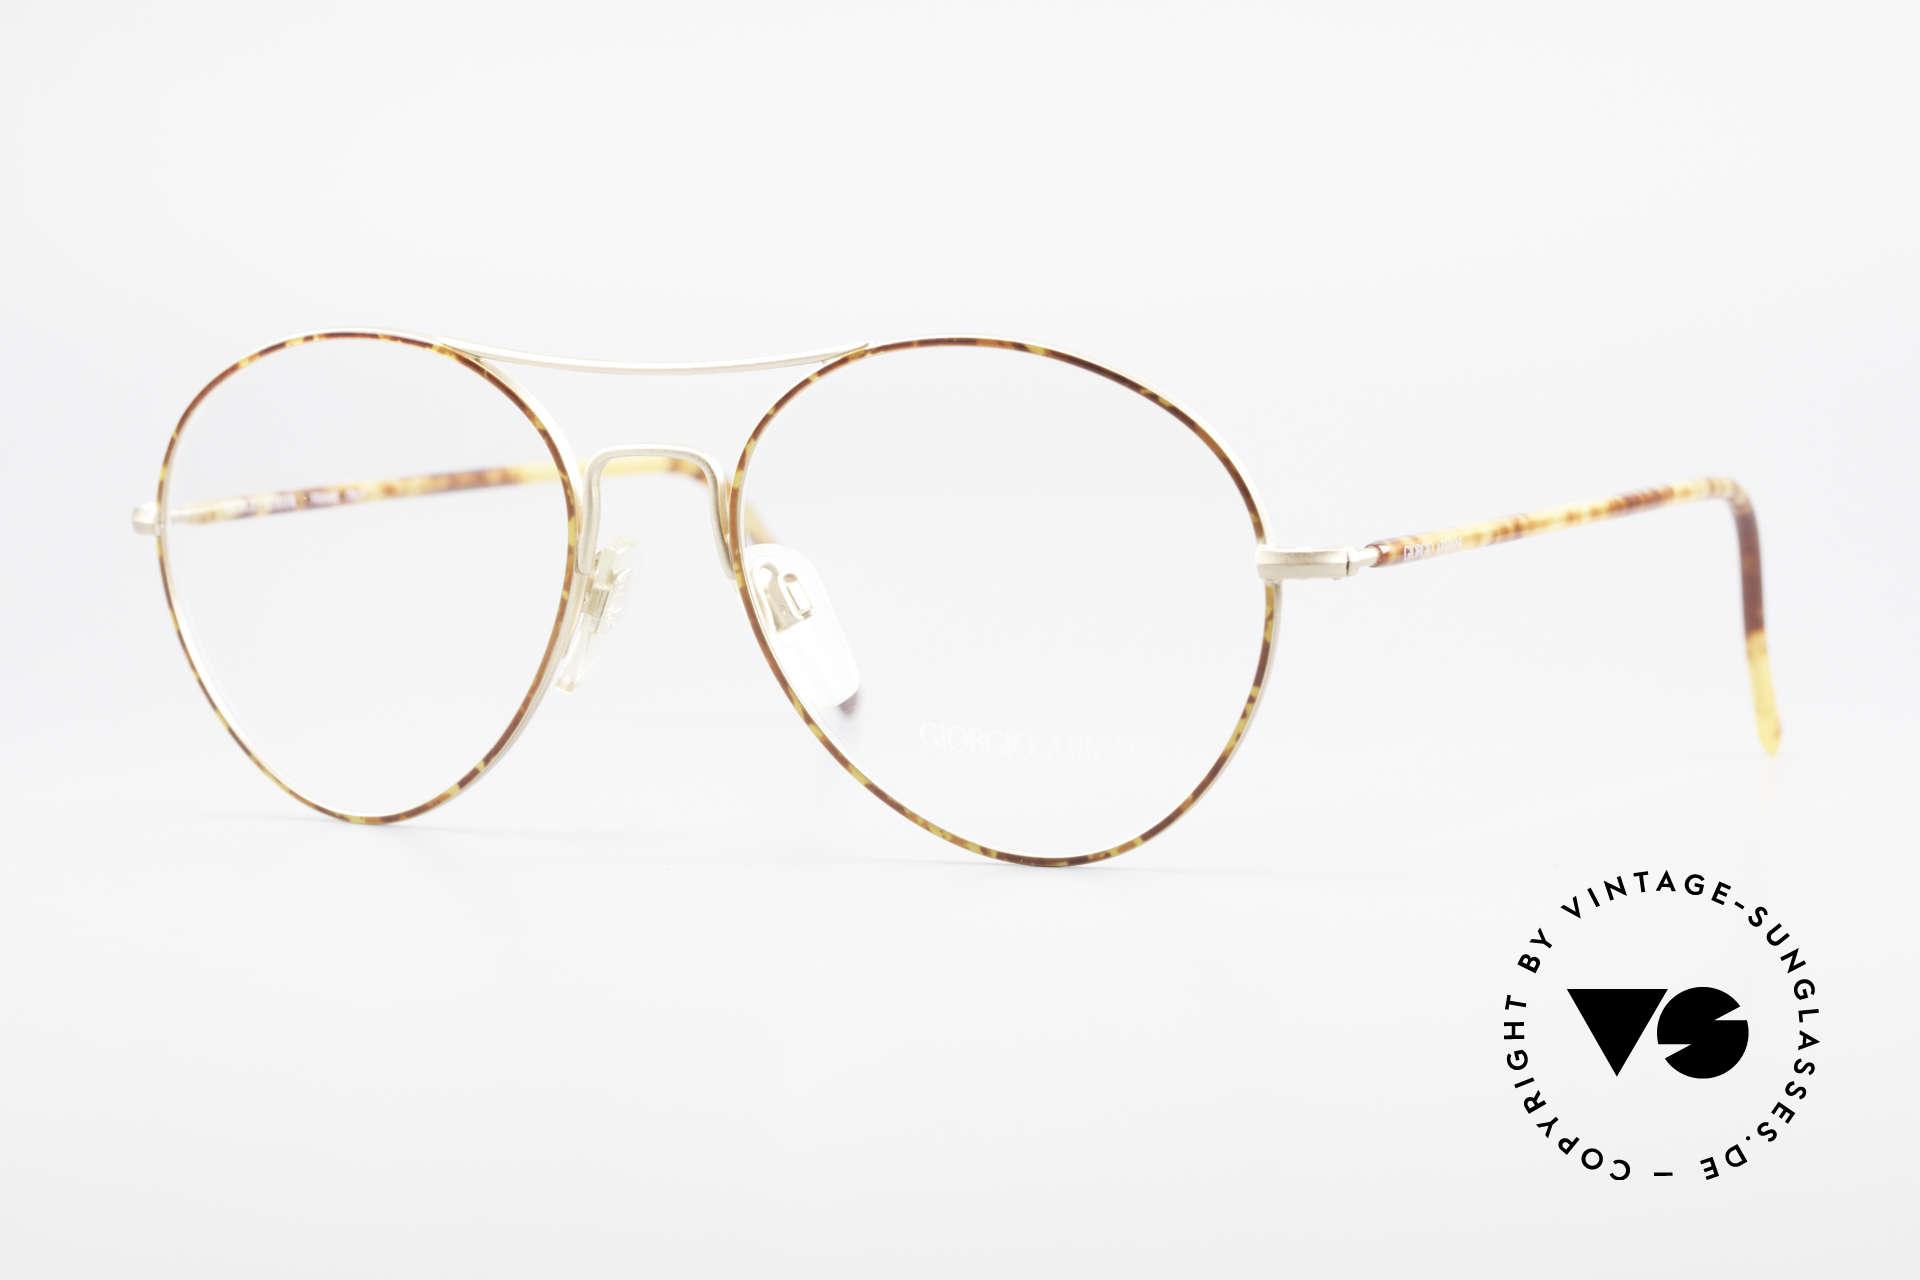 Giorgio Armani 120 Vintage Aviator Glasses Men, men's eyeglasses by the fashion designer G.Armani, Made for Men